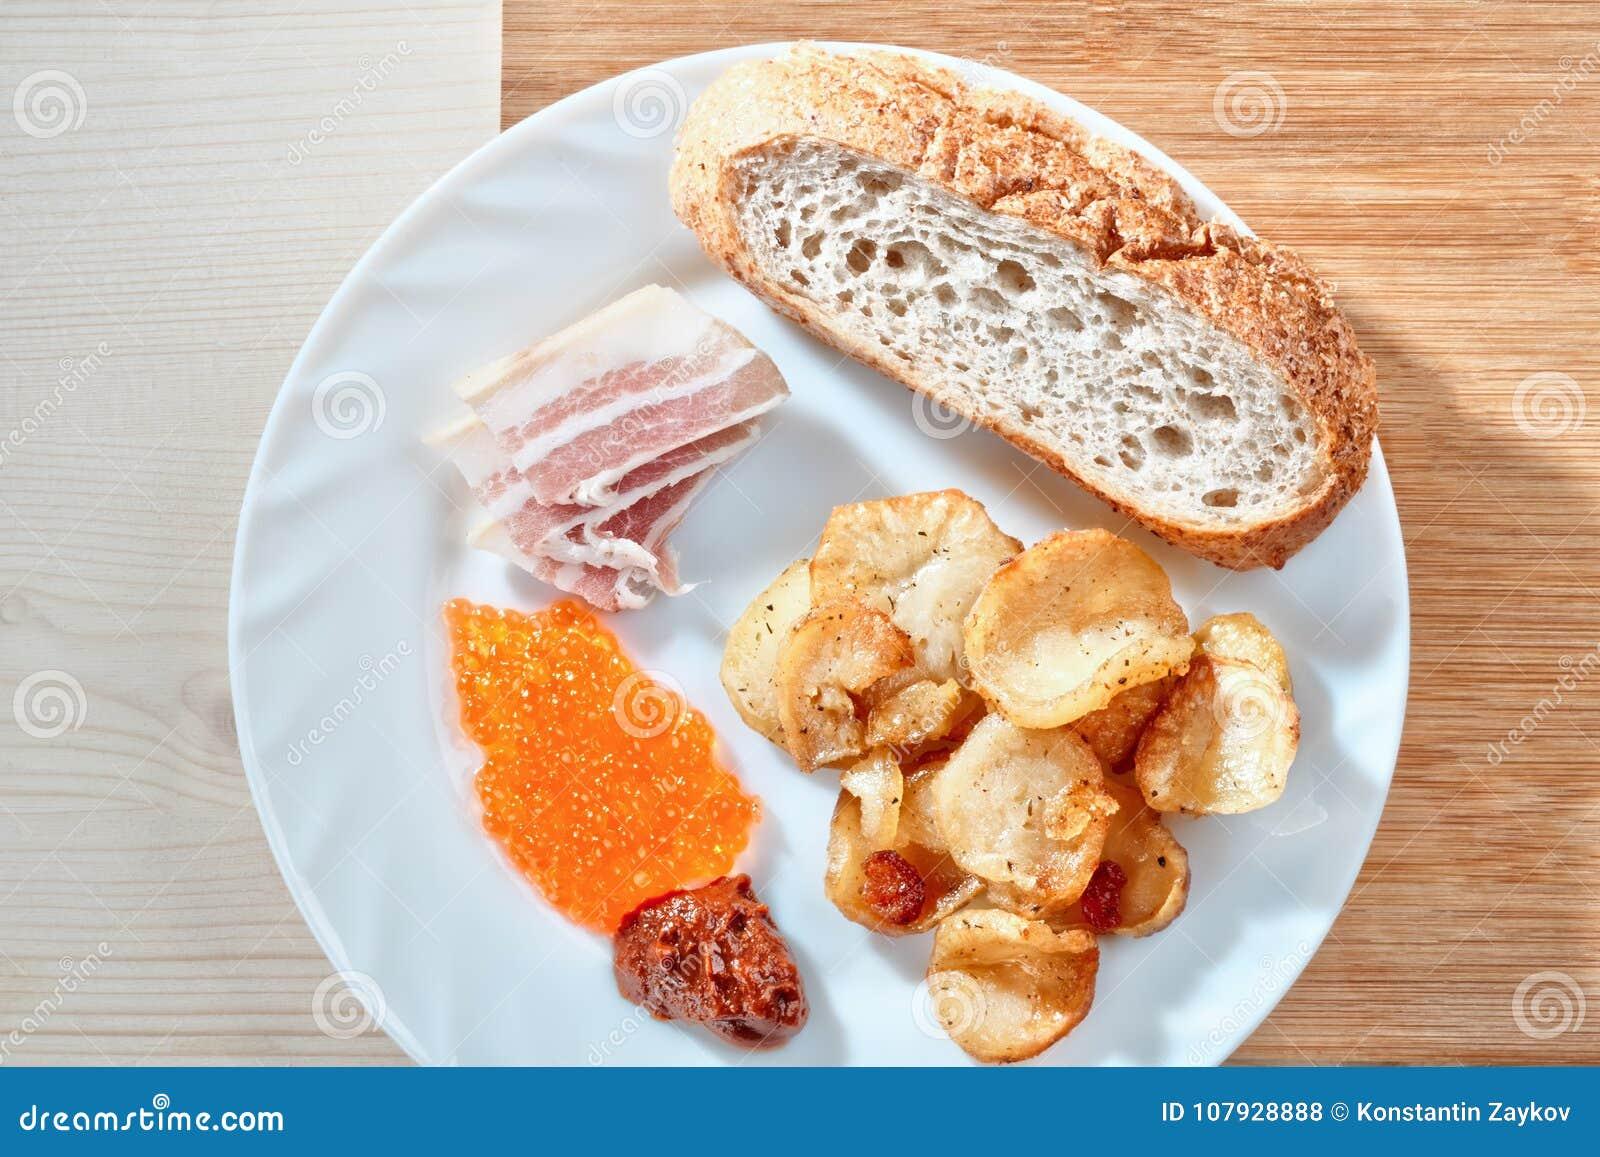 Tasty junk food. Greasy fried